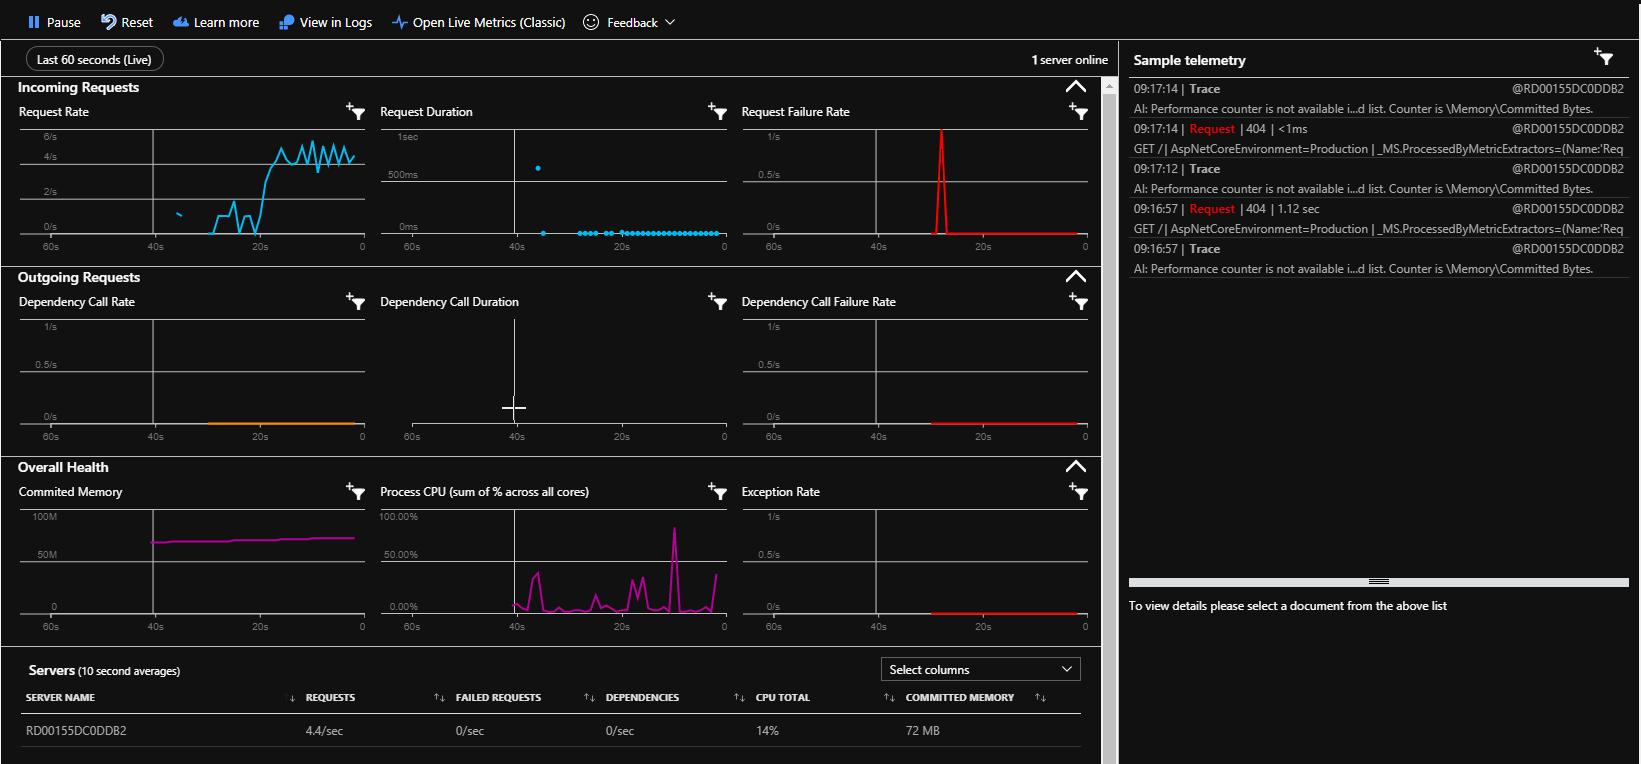 Azure Application Insights - Live Metrics Stream Sample Telemetry